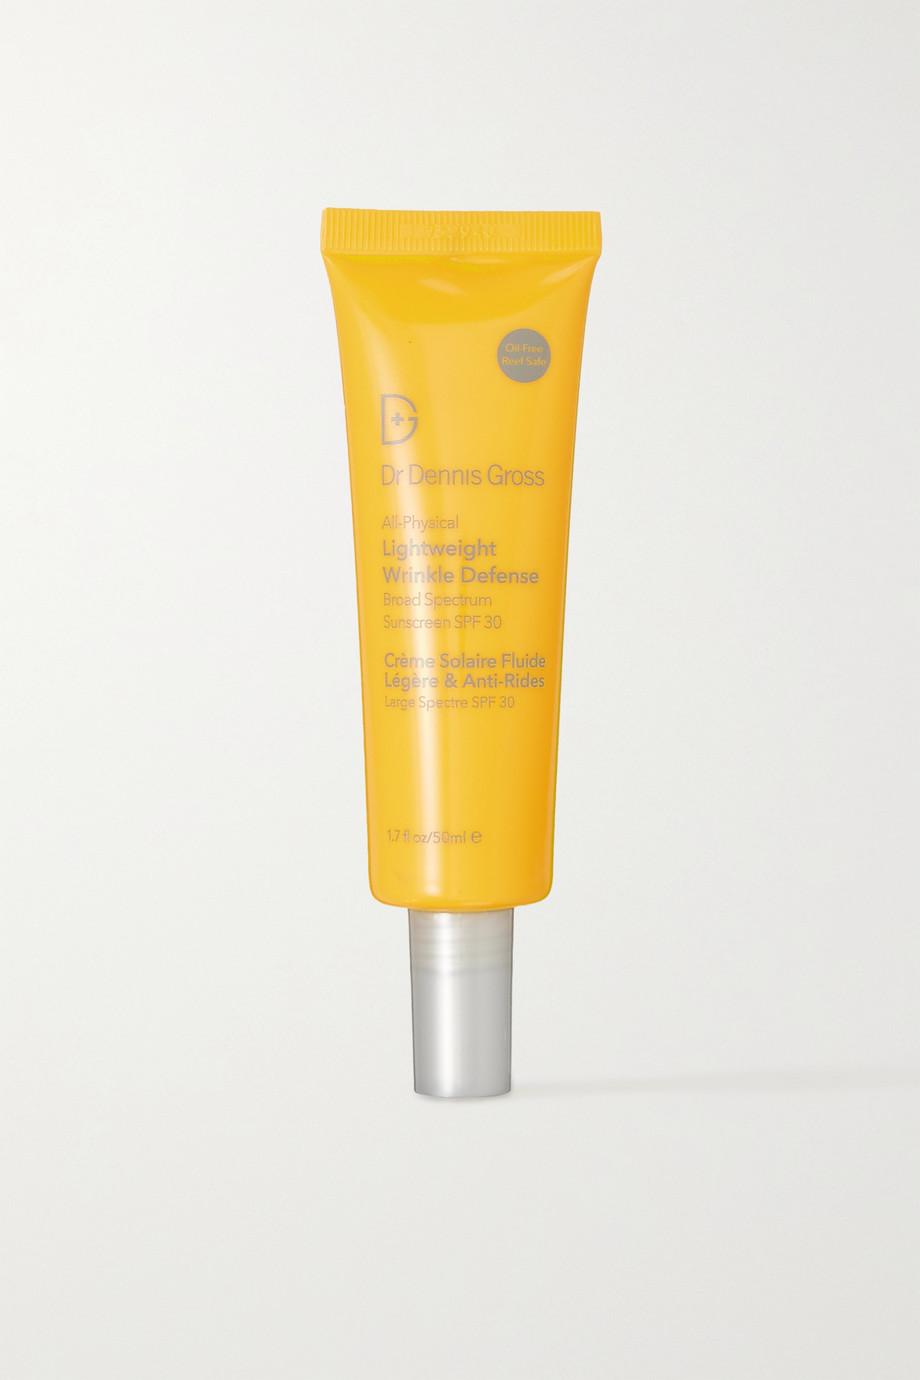 Dr. Dennis Gross Skincare All Physical Lightweight Wrinkle Defense Sunscreen LSF 30, 50 ml – Sonnencreme